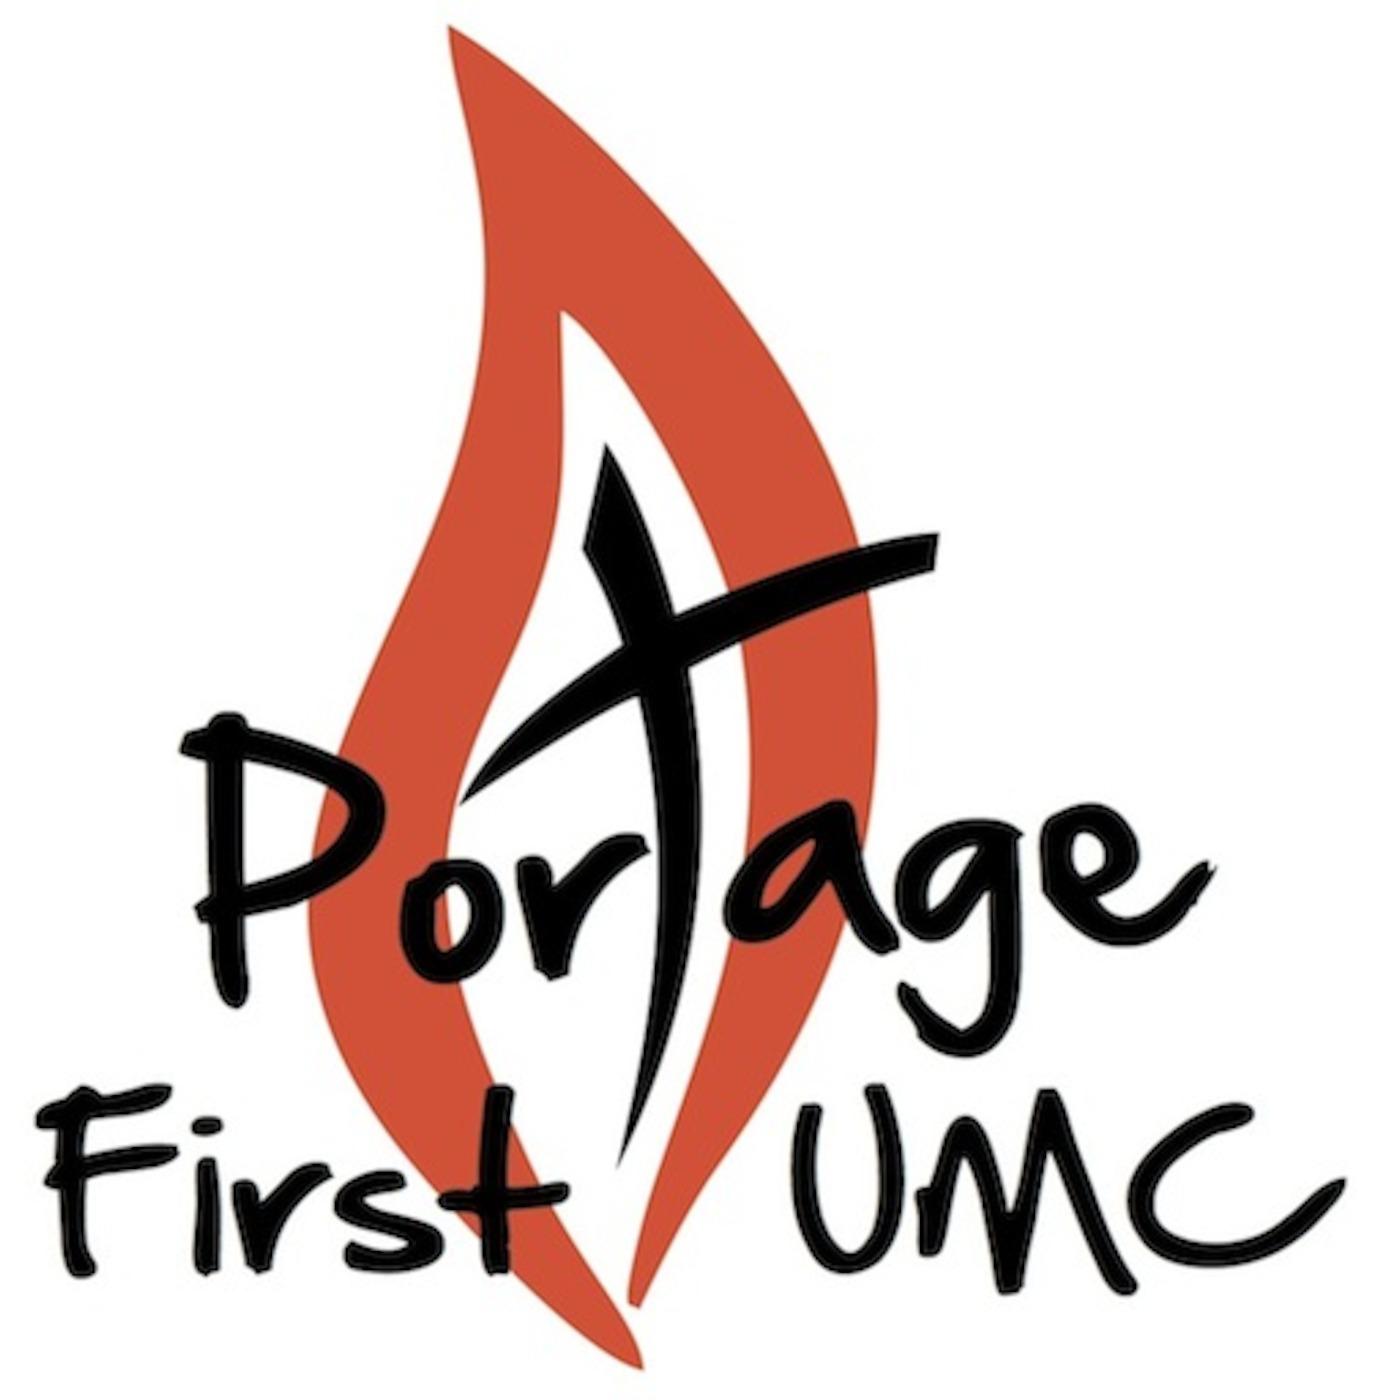 Portage First United Methodist Church